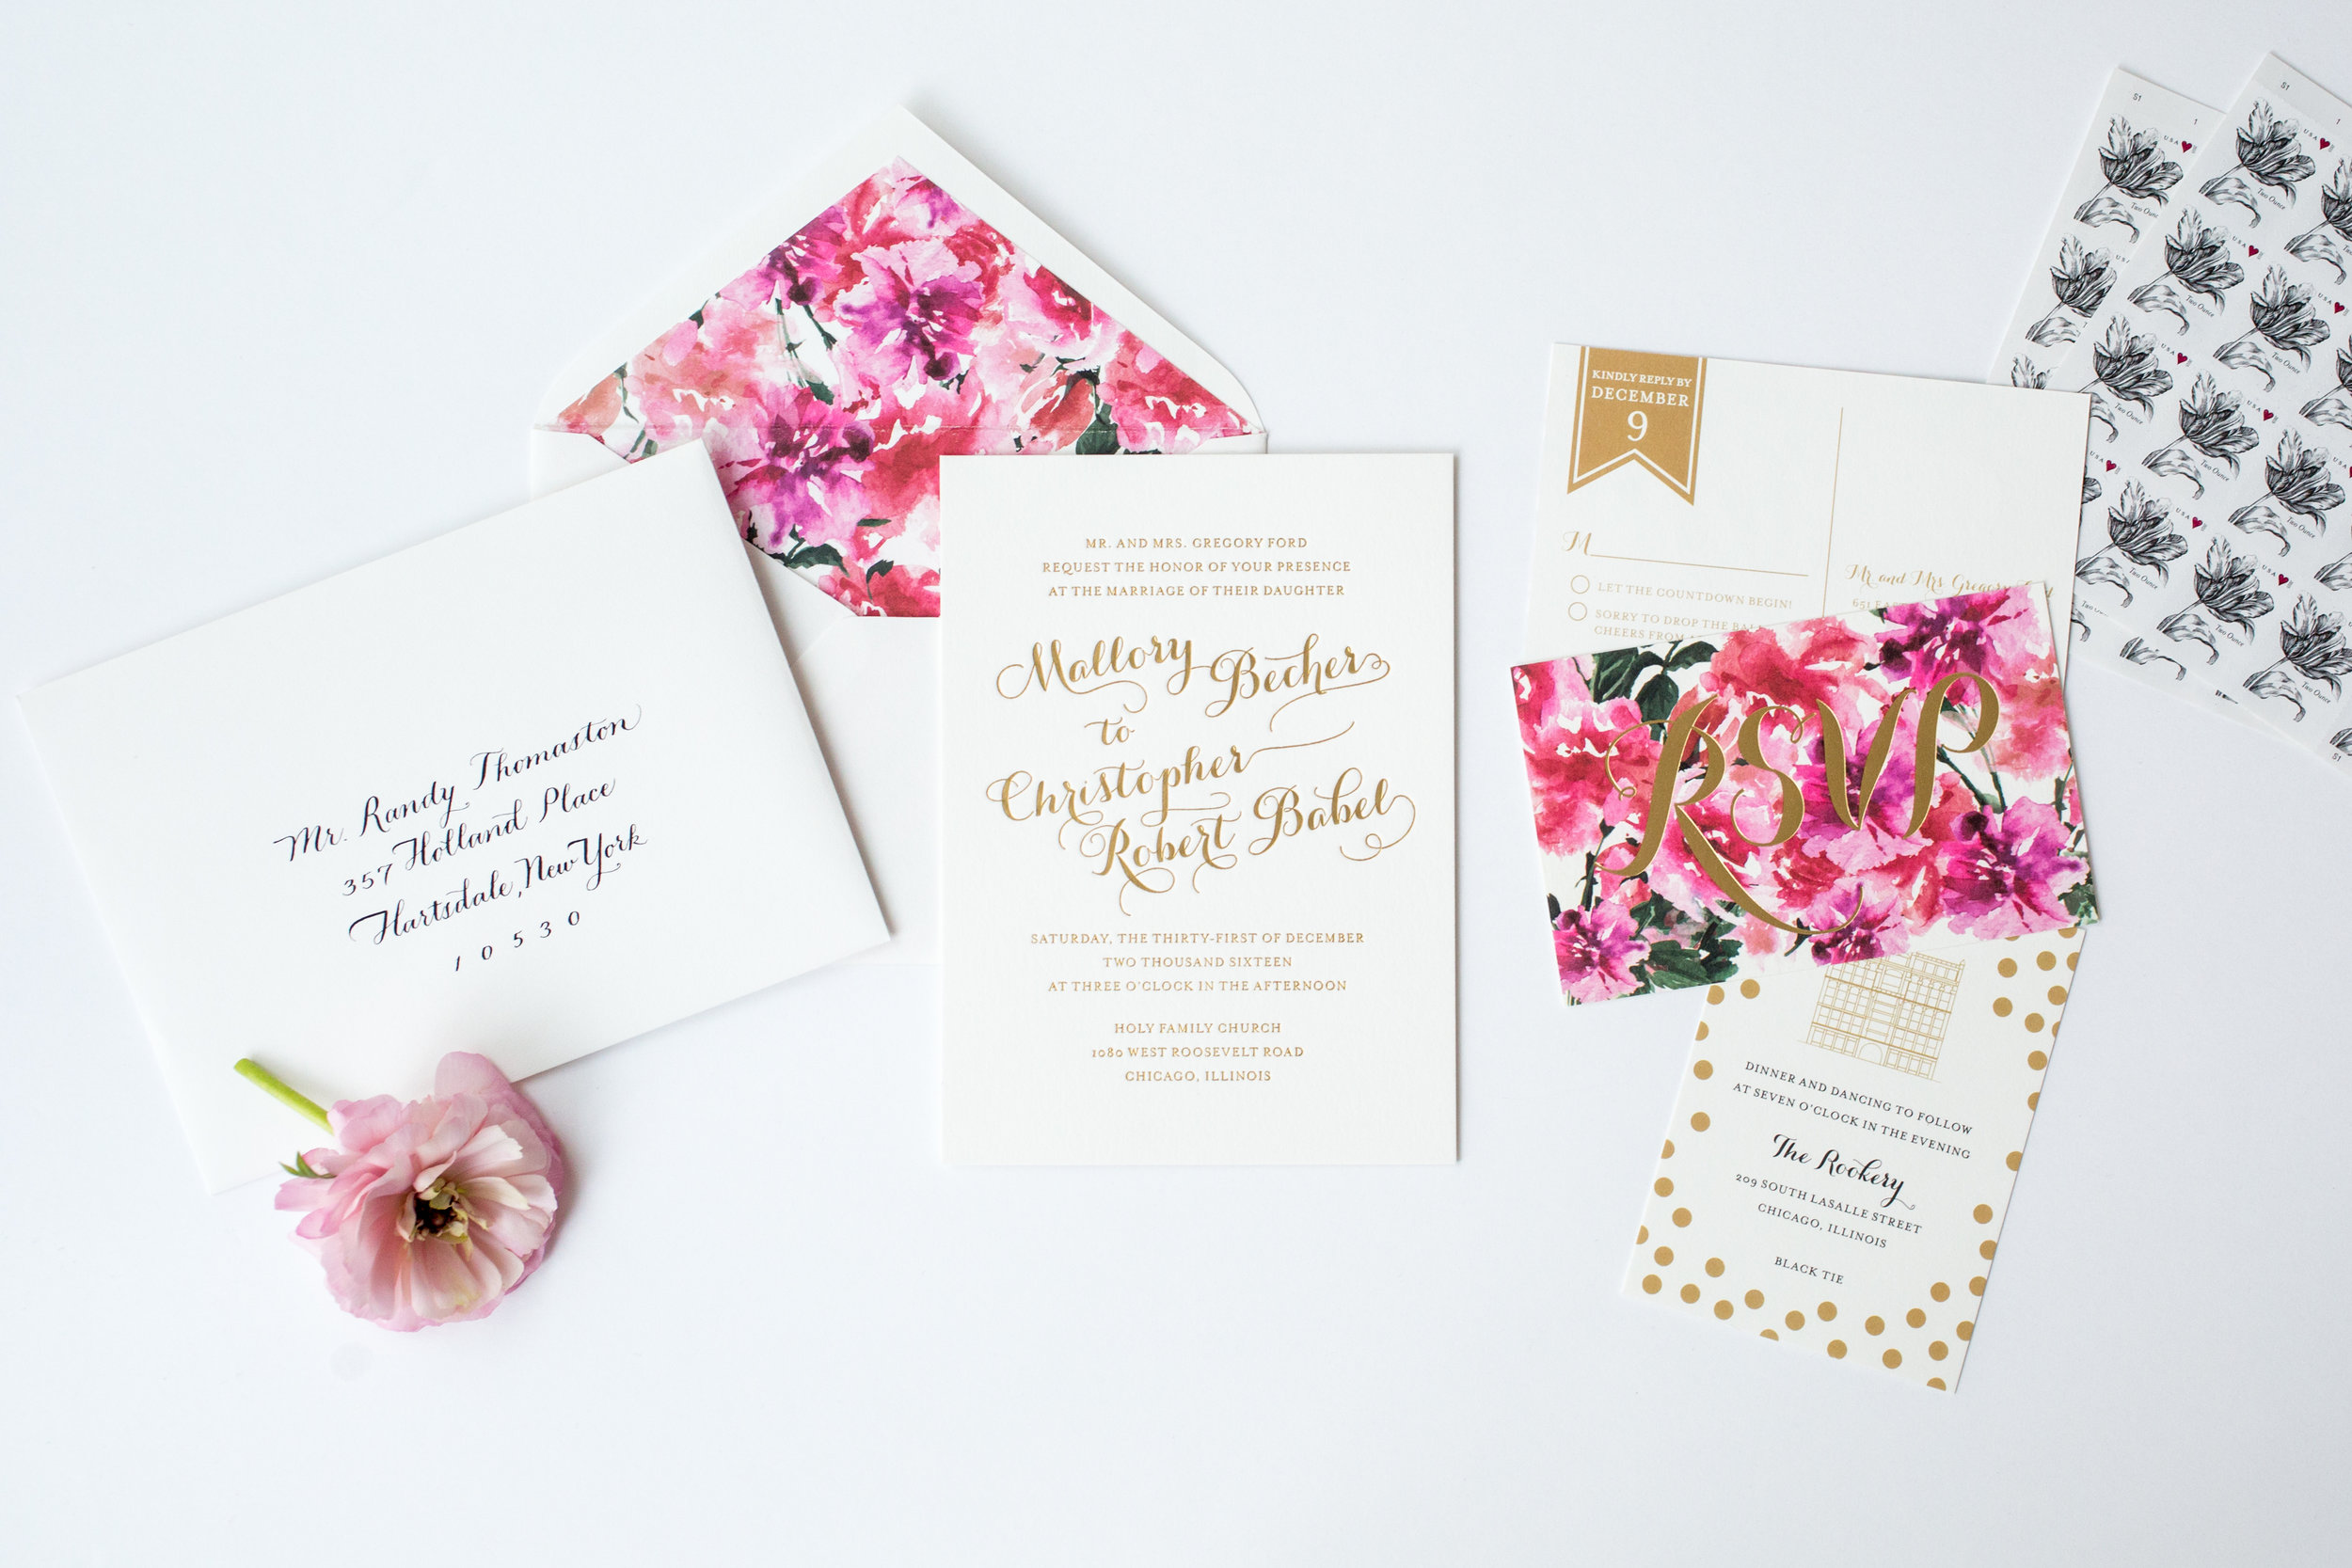 magnificent milestones | wedding invitations | garden collection